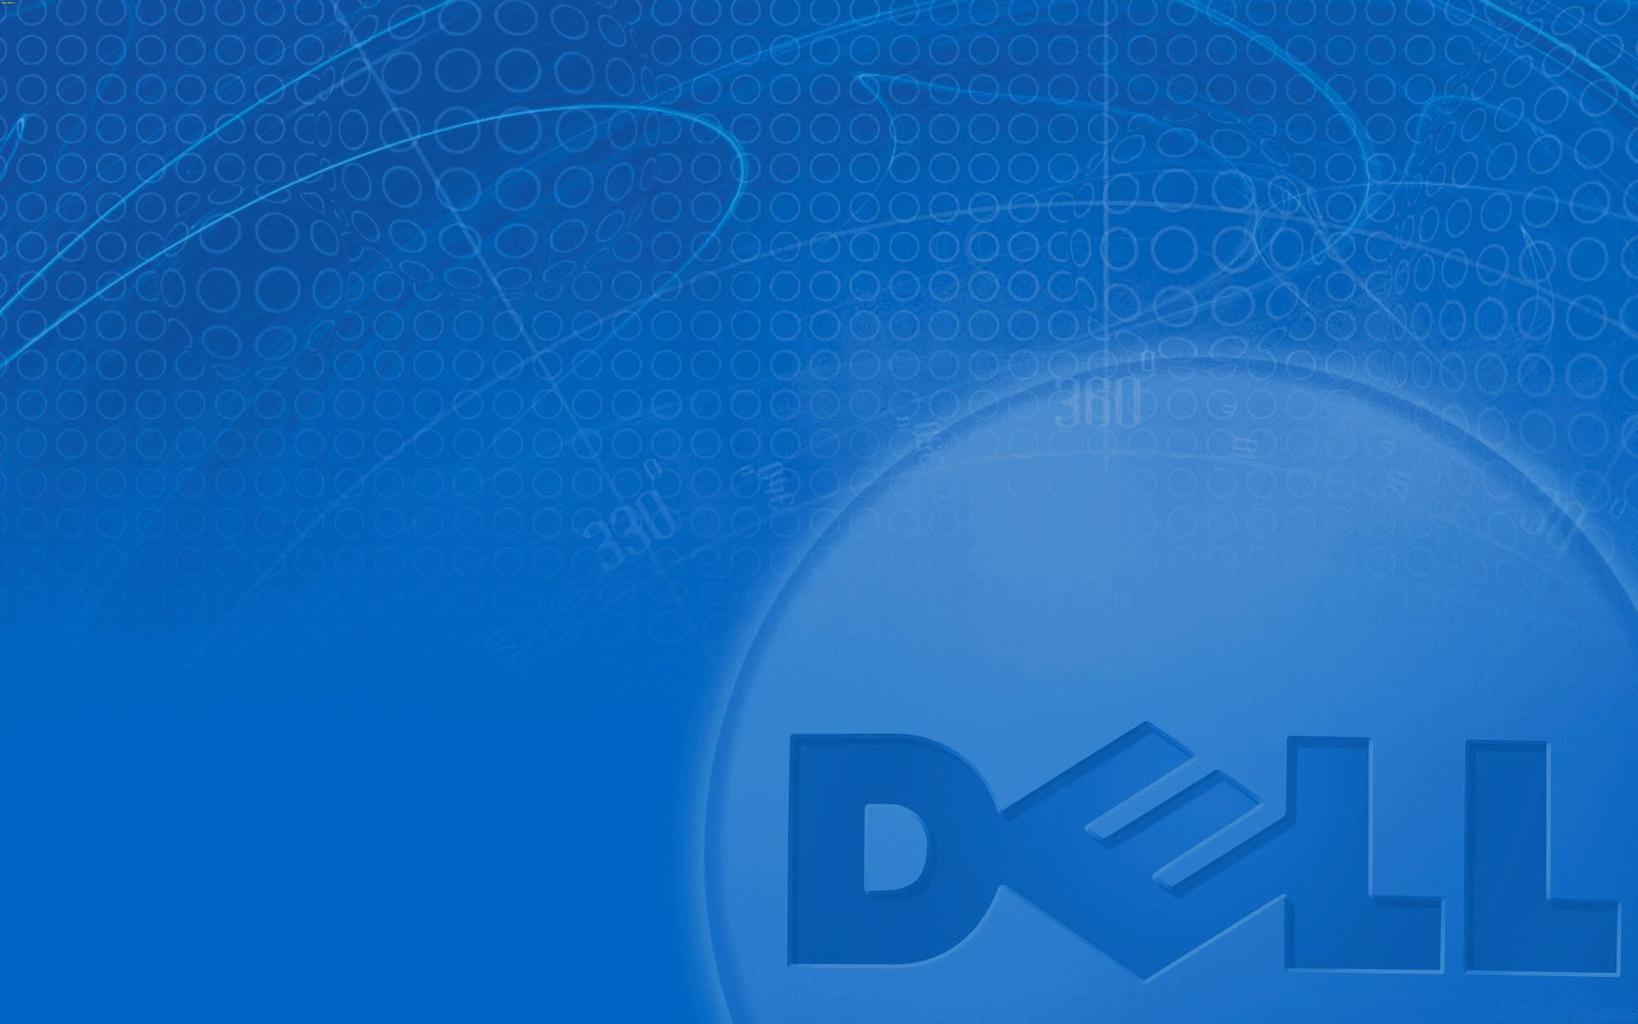 Papel De Parede Dell G3: 求dell桌面壁纸1920*1200 一张_百度知道